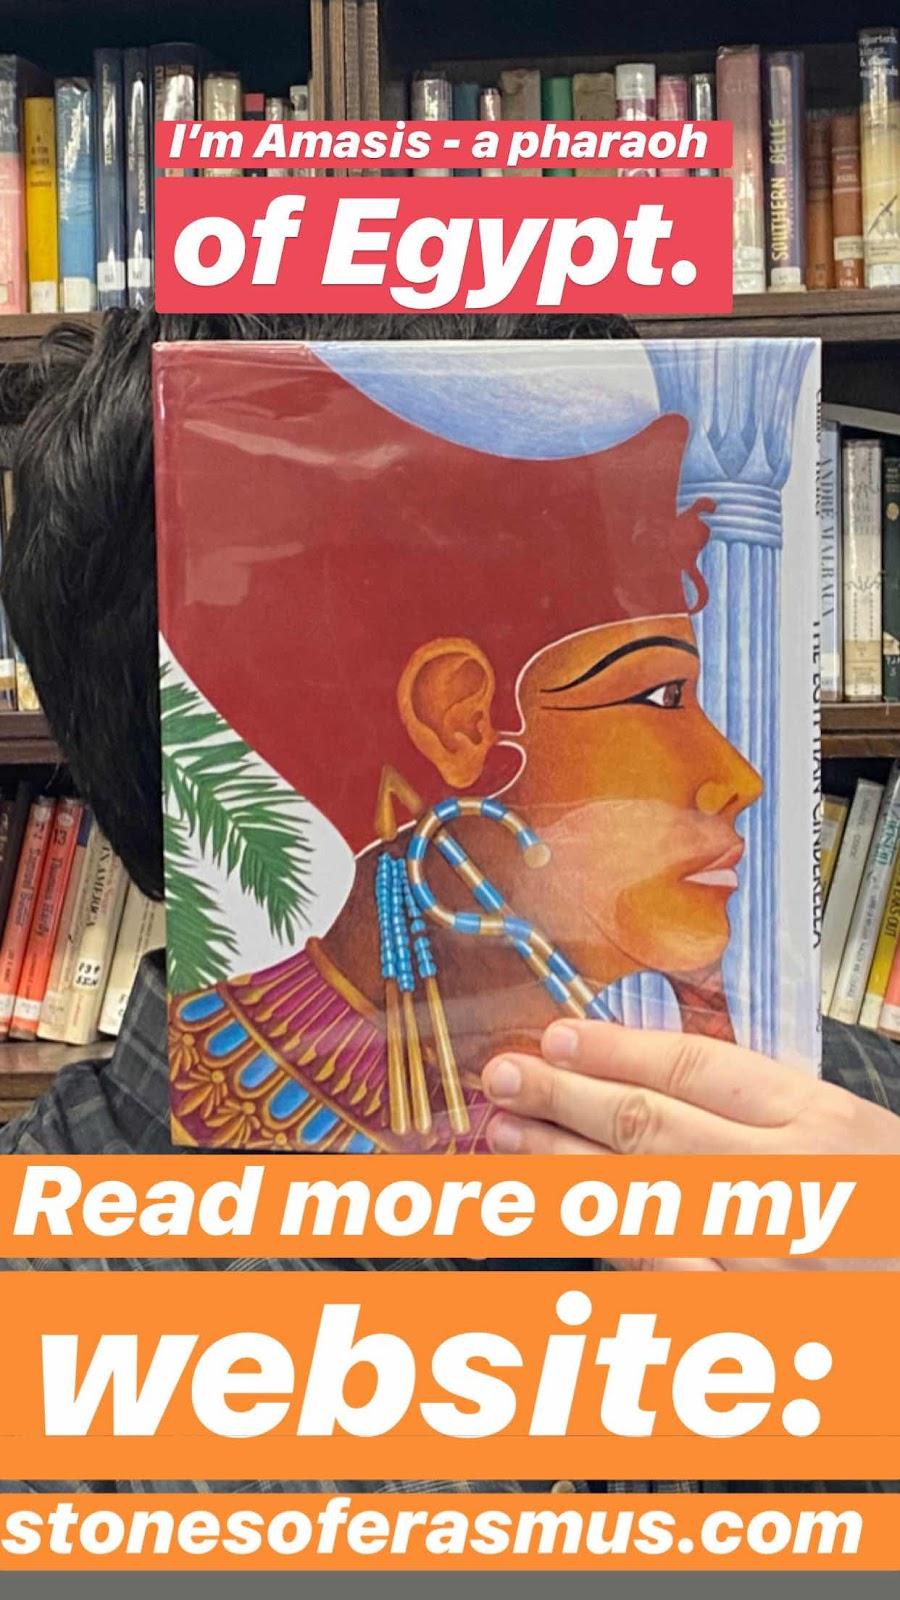 I'm Amasis — a Pharaoh of Egypt. Read more on my blog stonesoferasmus.com